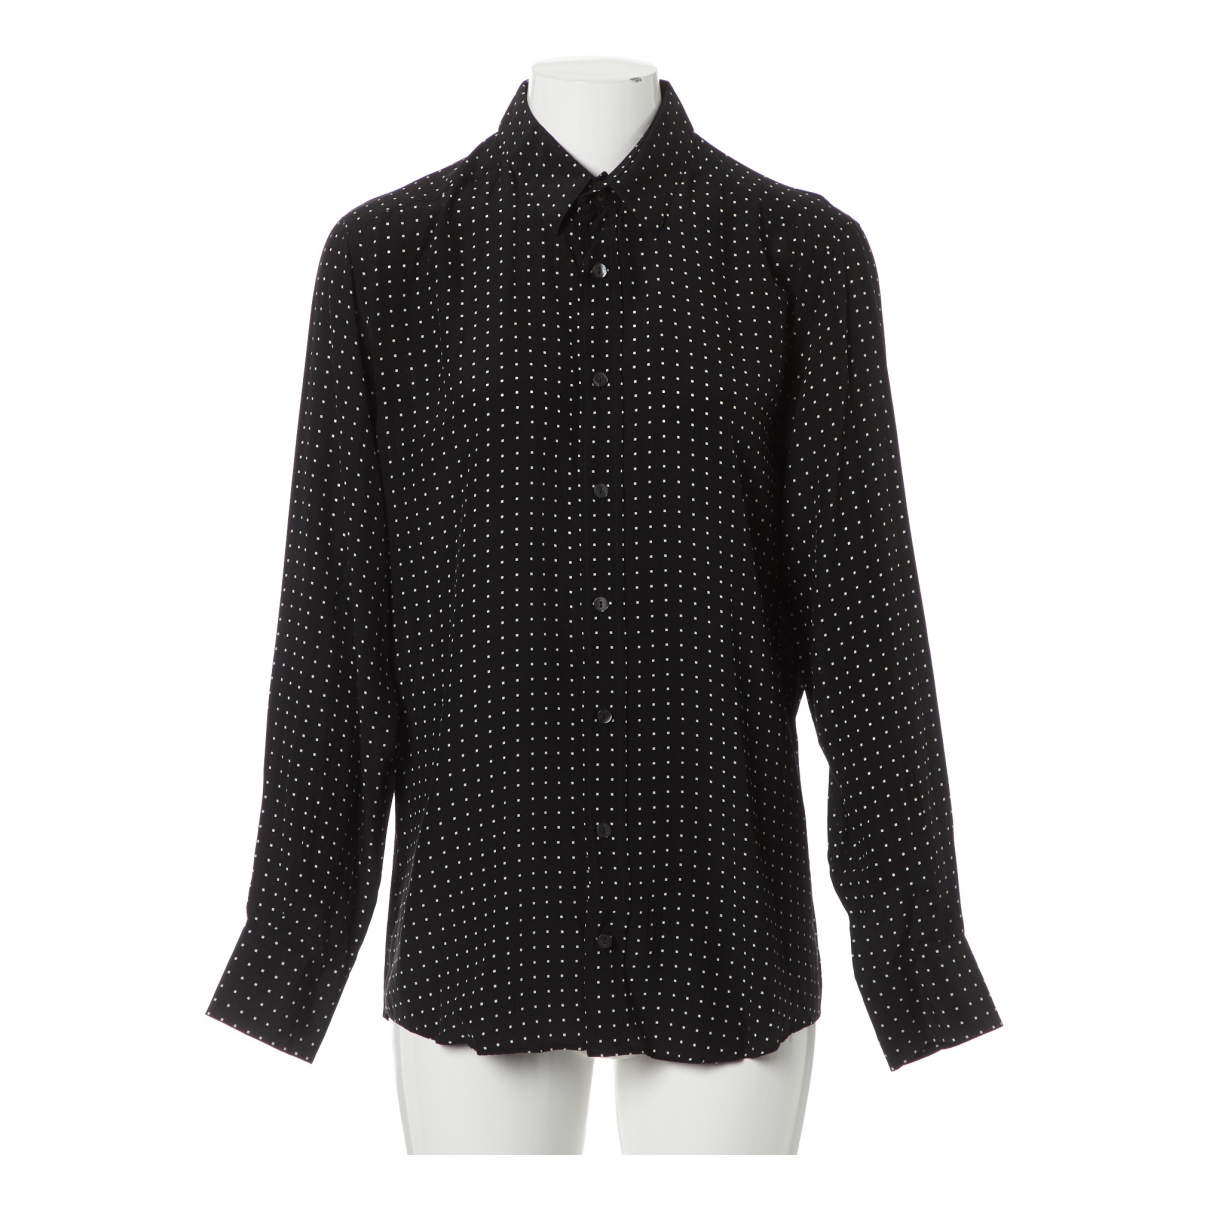 Dolce & Gabbana \N Black Silk Shirts for Men 40 EU (tour de cou / collar)